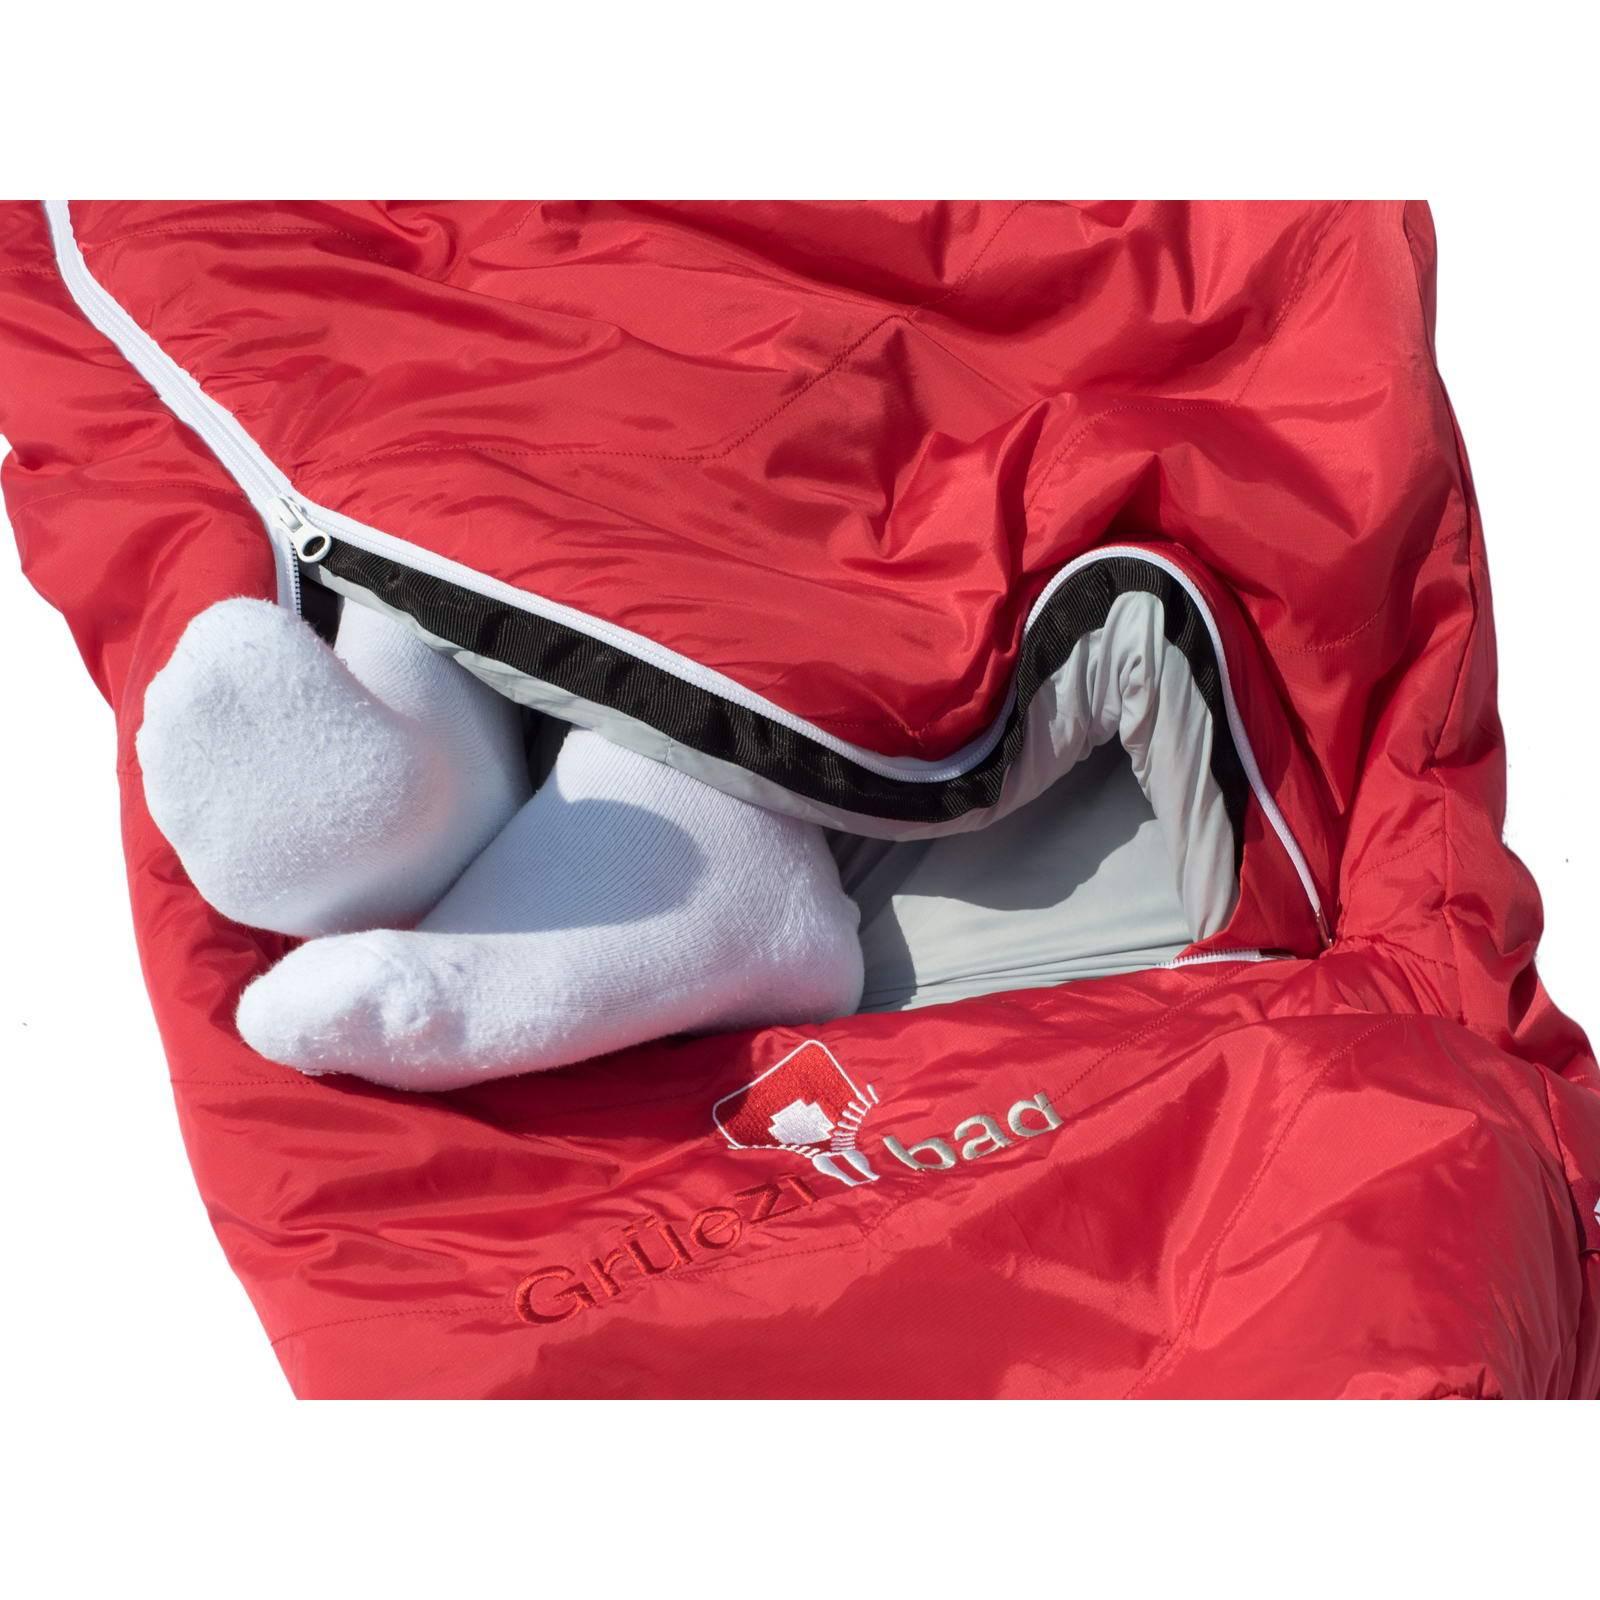 Grüezi Bag Biopod Wolle Zero XL - Wollschlafsack - Bild 5